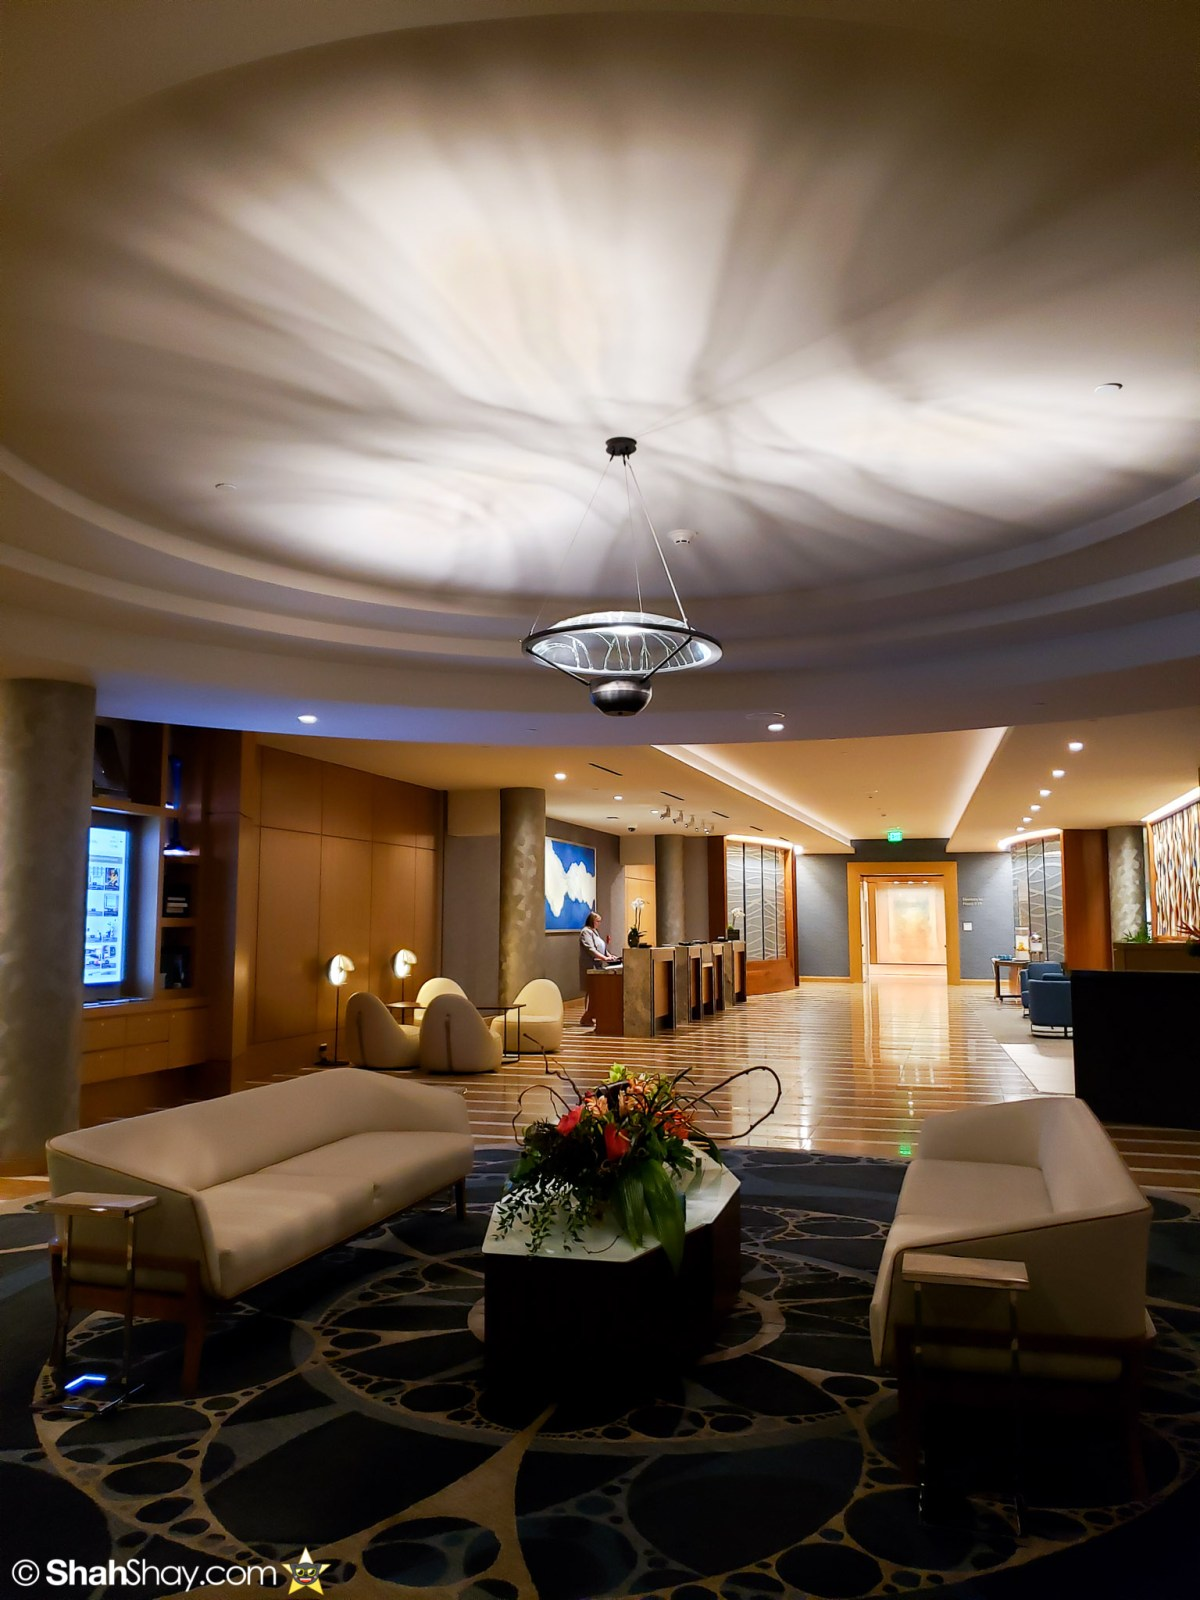 InterContinental San Diego - Lobby